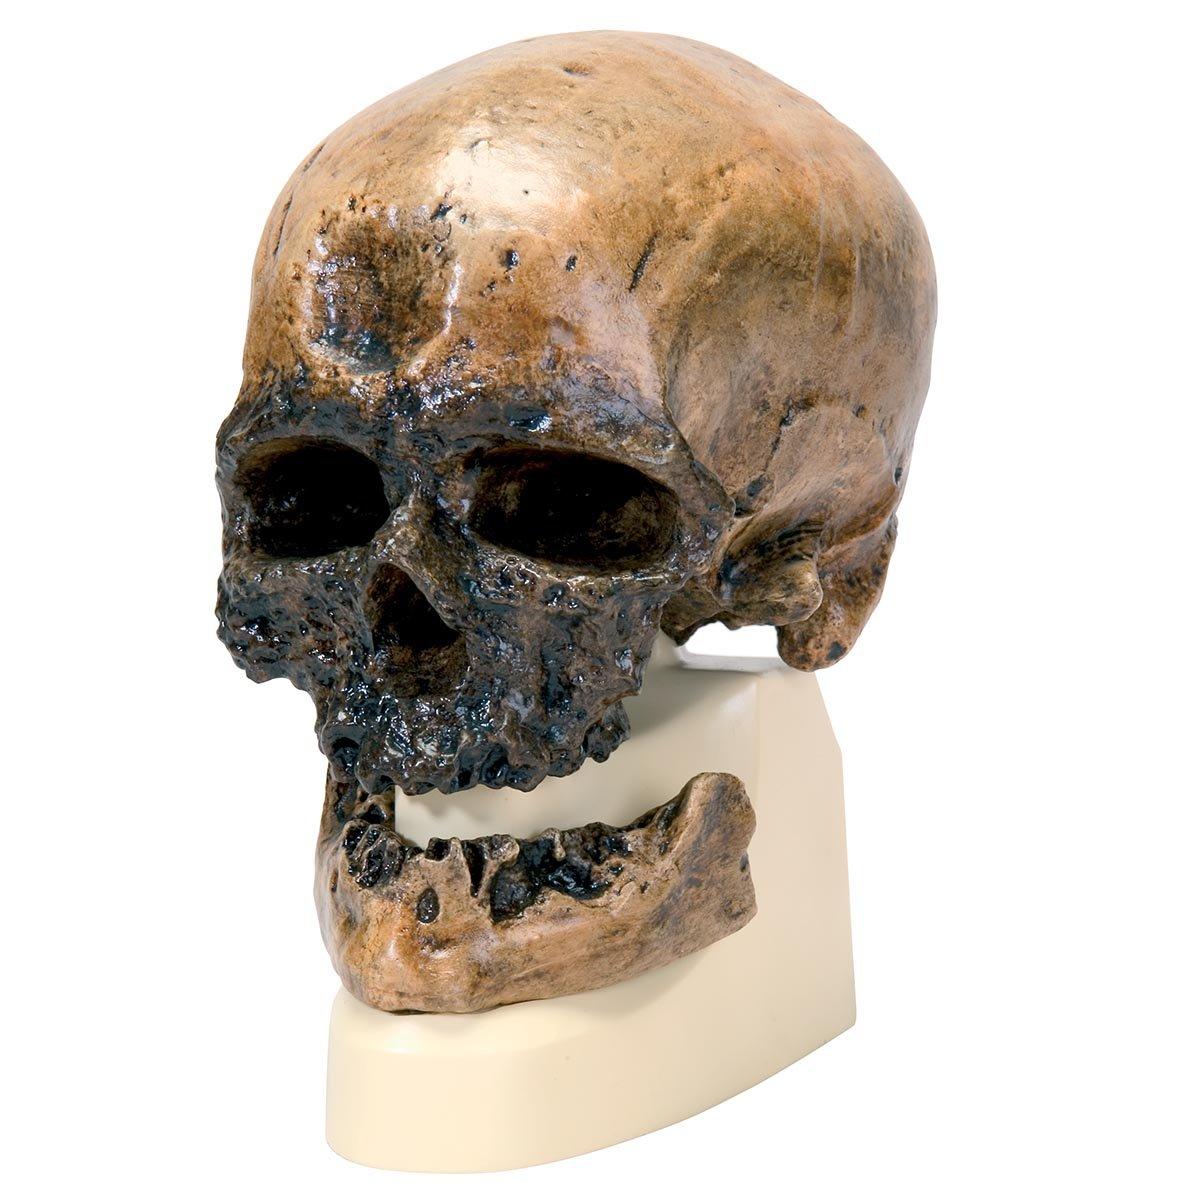 3B Scientific VP752/1 Replica di Cranio Homo Sapiens